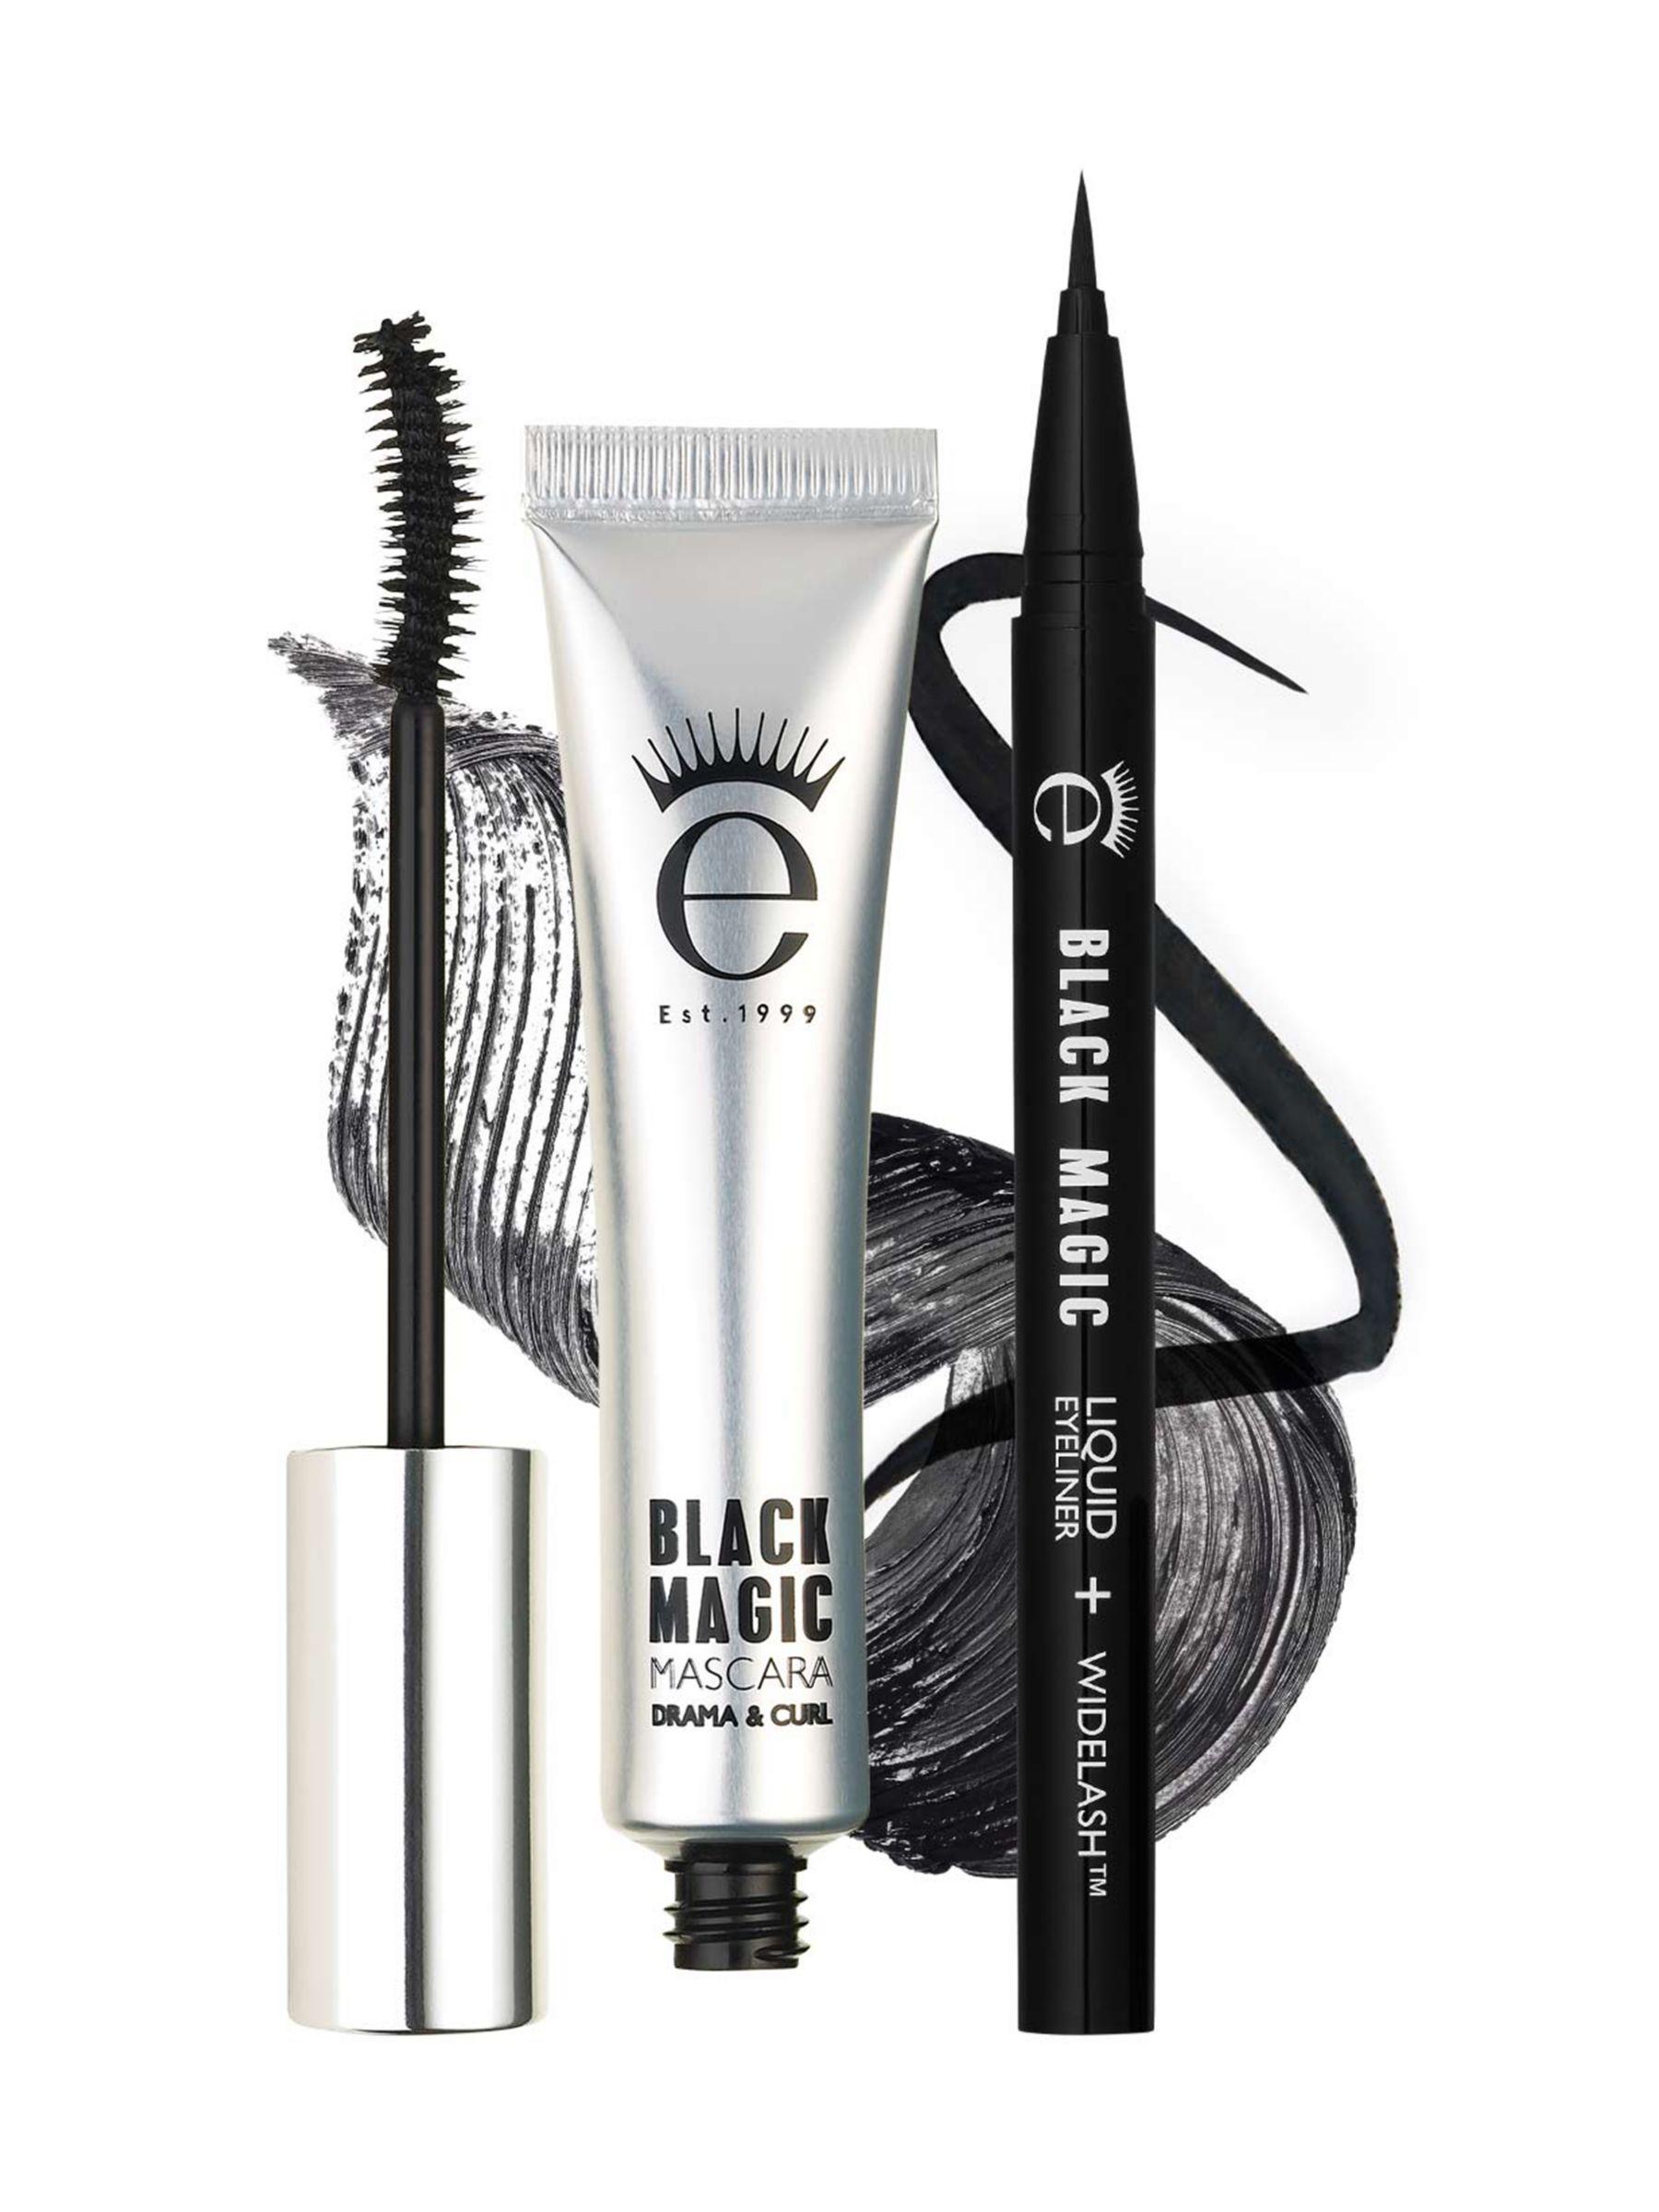 Eyeko Eyeko Black Magic Mascara + Liquid Eyeliner Set